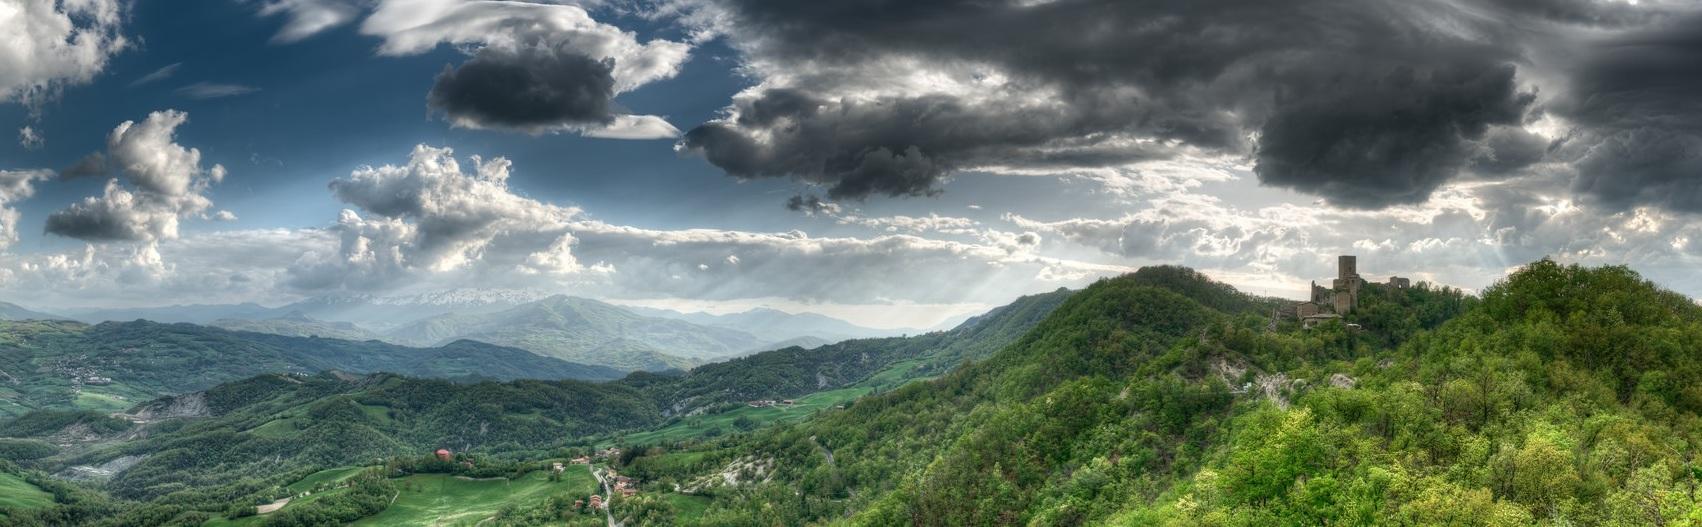 Tappa N.5 : da Canossa a Carpineti (27.6 KM)